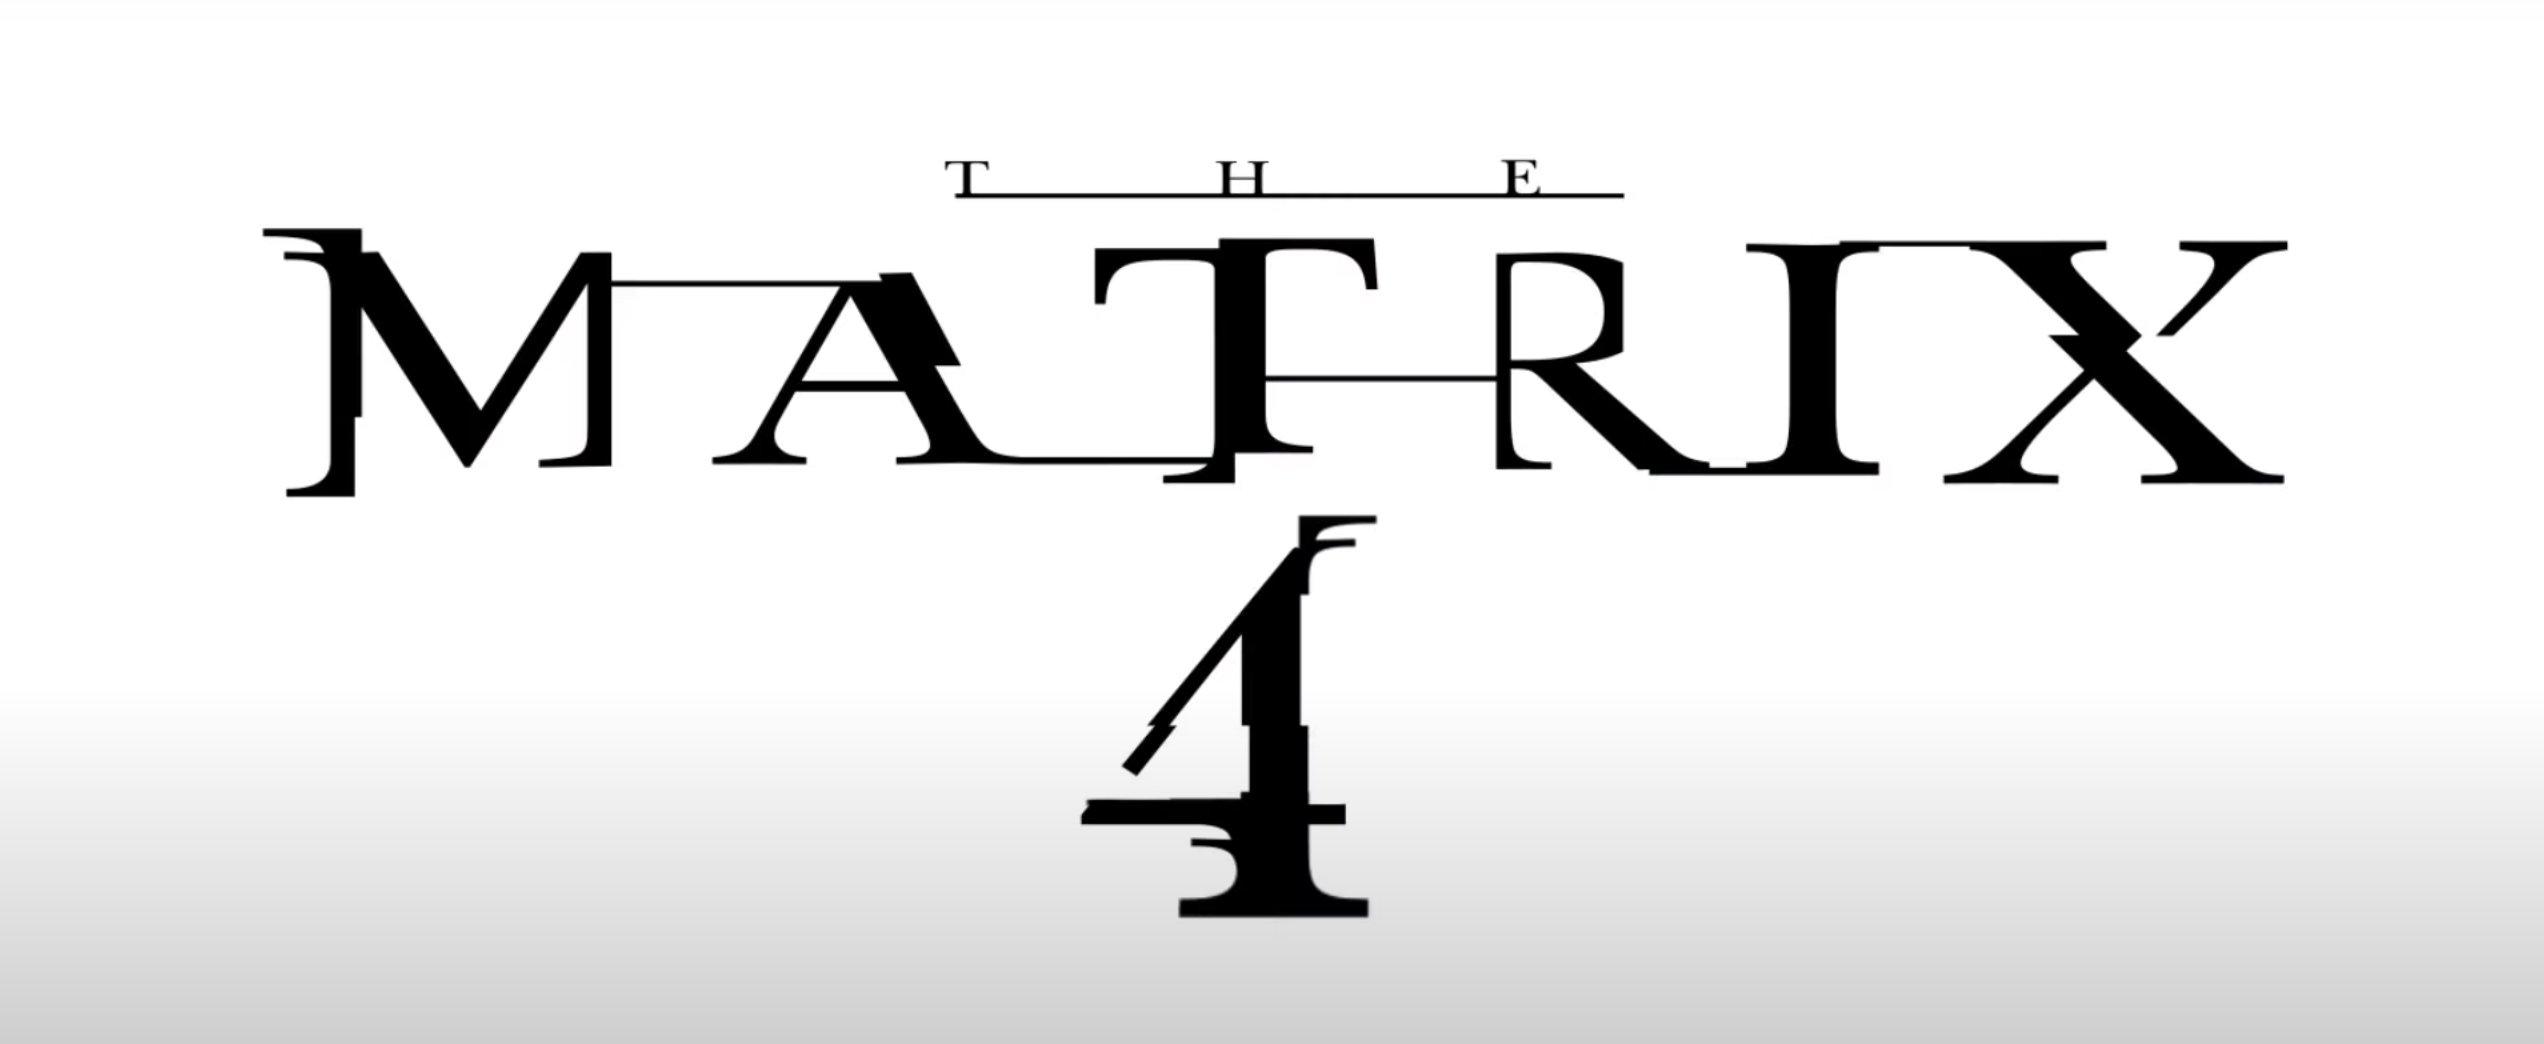 Comercial do HBO Max revela o logo de Matrix 4